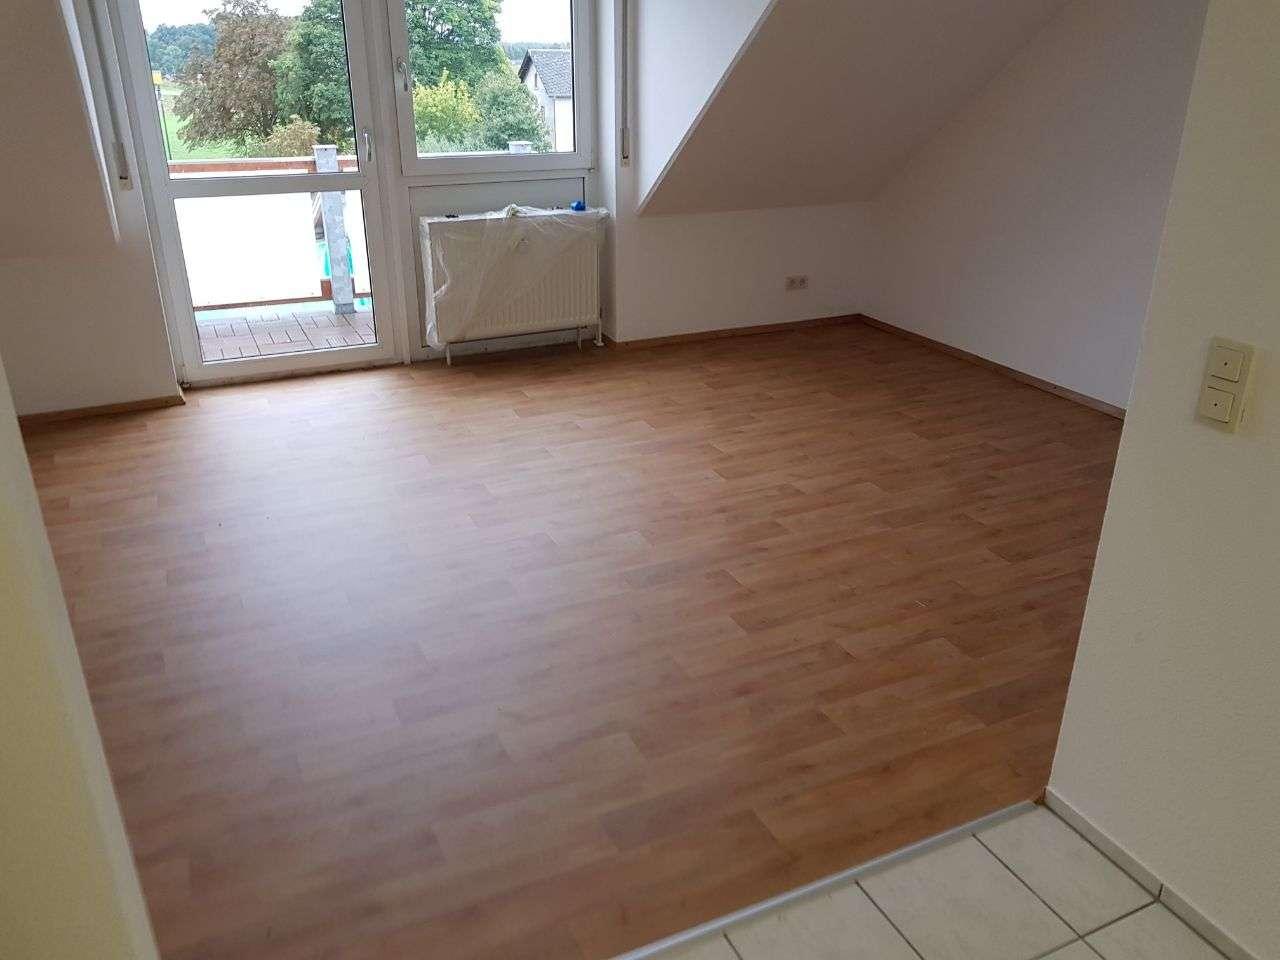 Helles, geräumiges Appartement in Gattendorf nähe FH Hof in Gattendorf